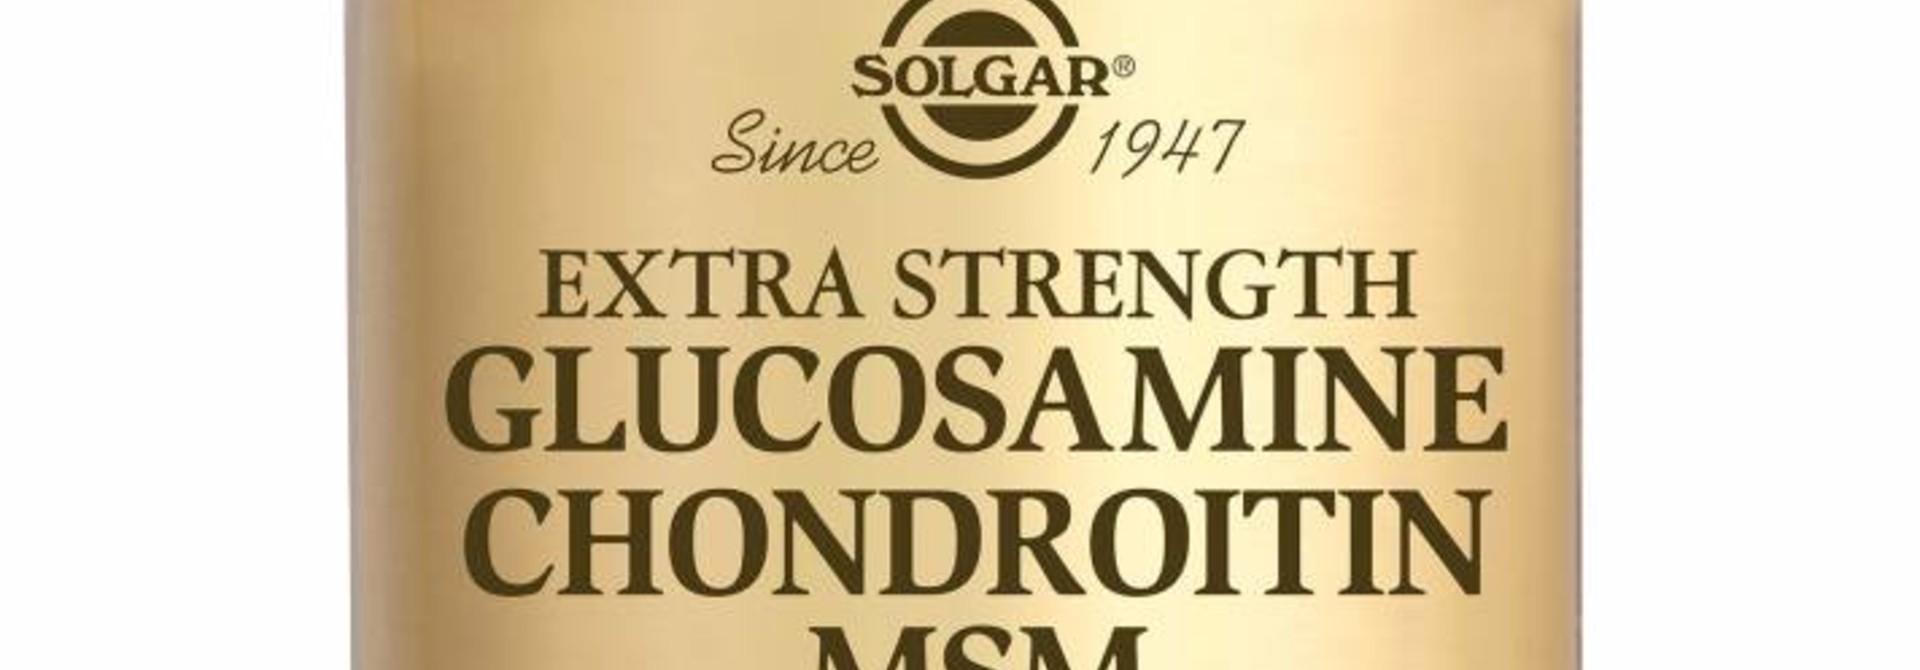 Glucosamine Chondroitin MSM 60 tabletten